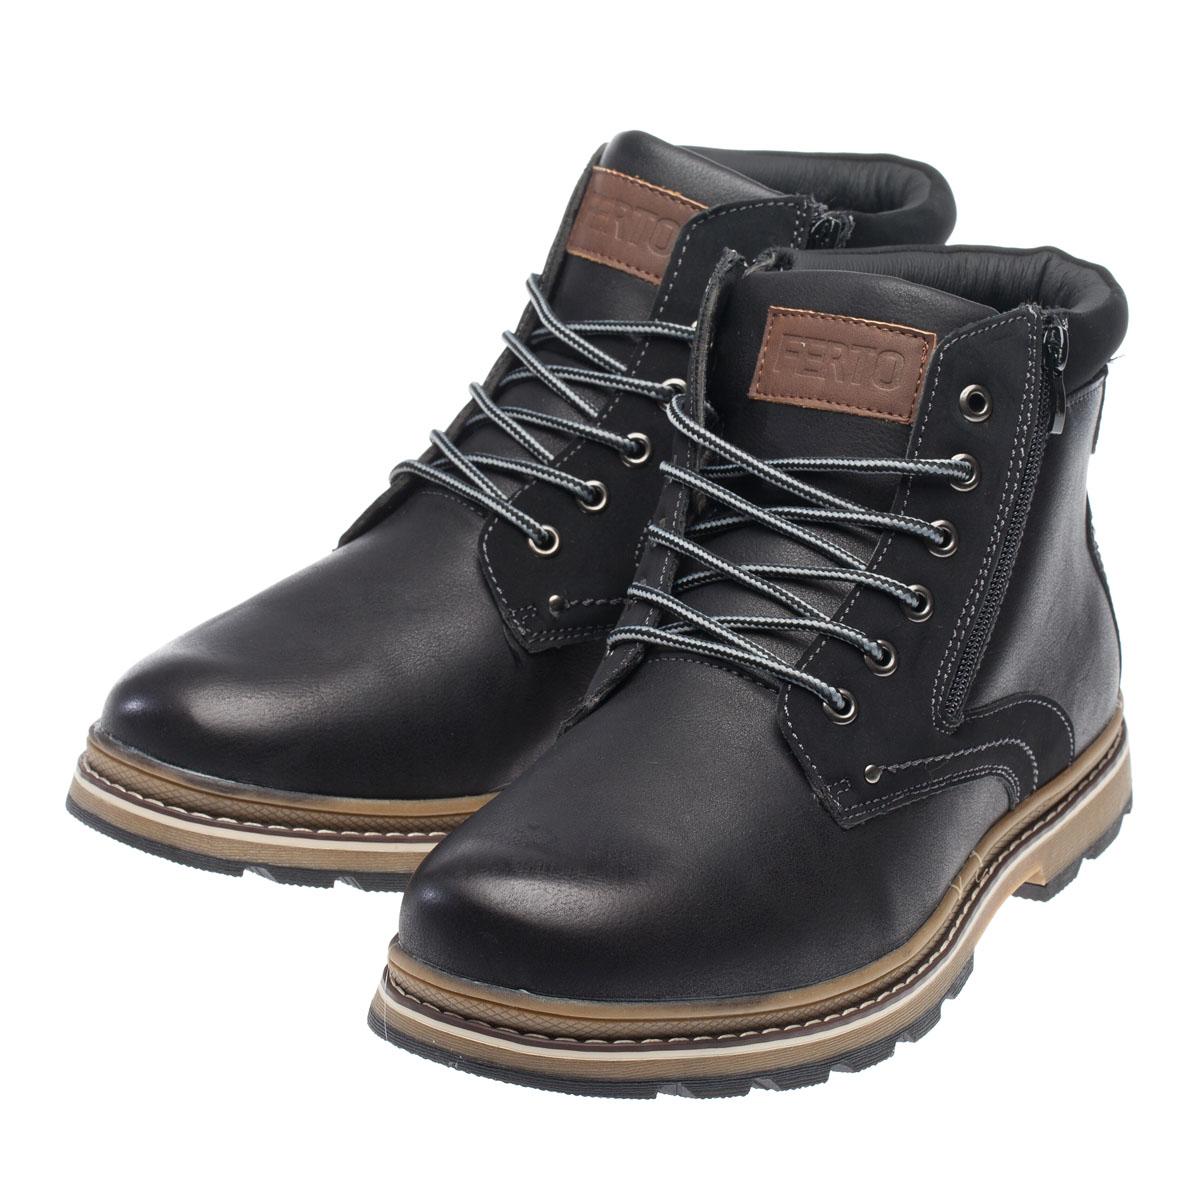 Ботинки зимние FERTO, WF 8429-1